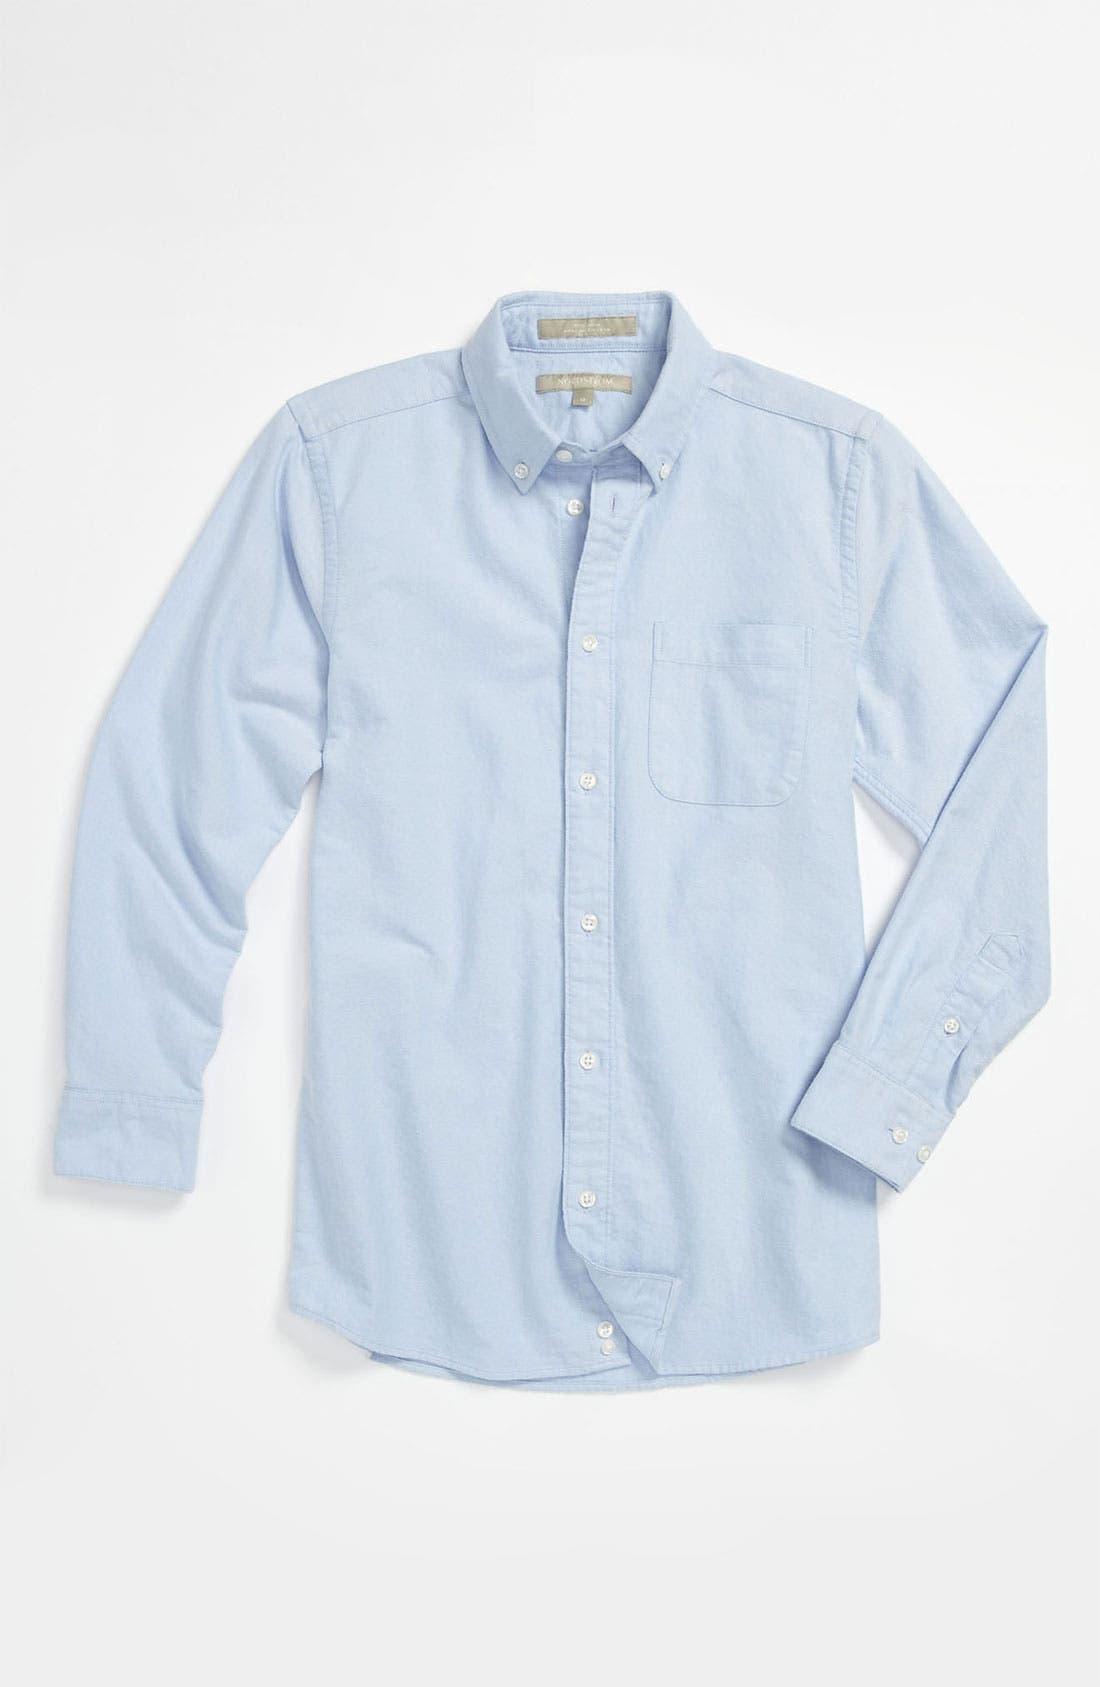 Alternate Image 1 Selected - Nordstrom 'Michael' Woven Oxford Shirt (Big Boys)